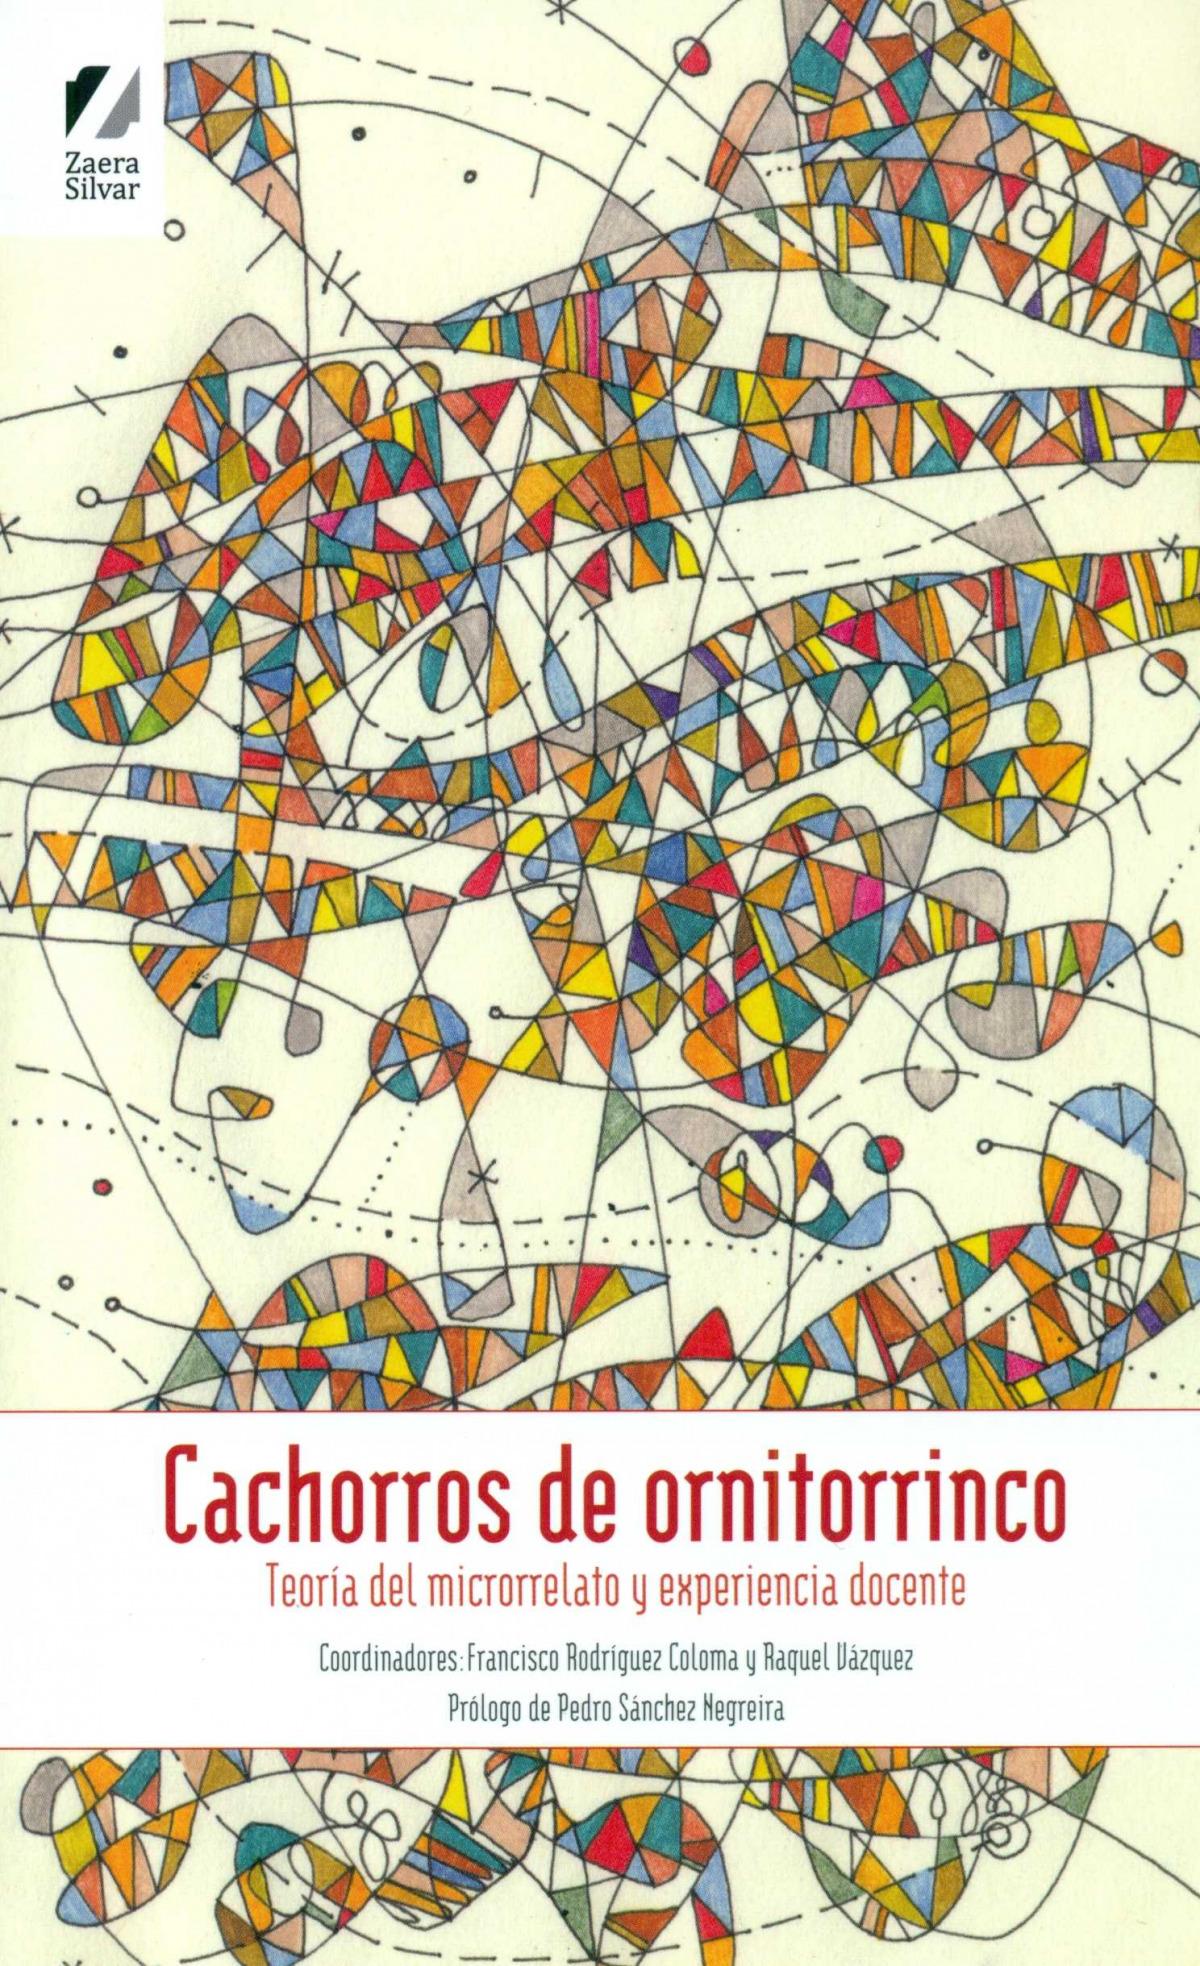 Cachorros de ornitorrinco 9788494137648